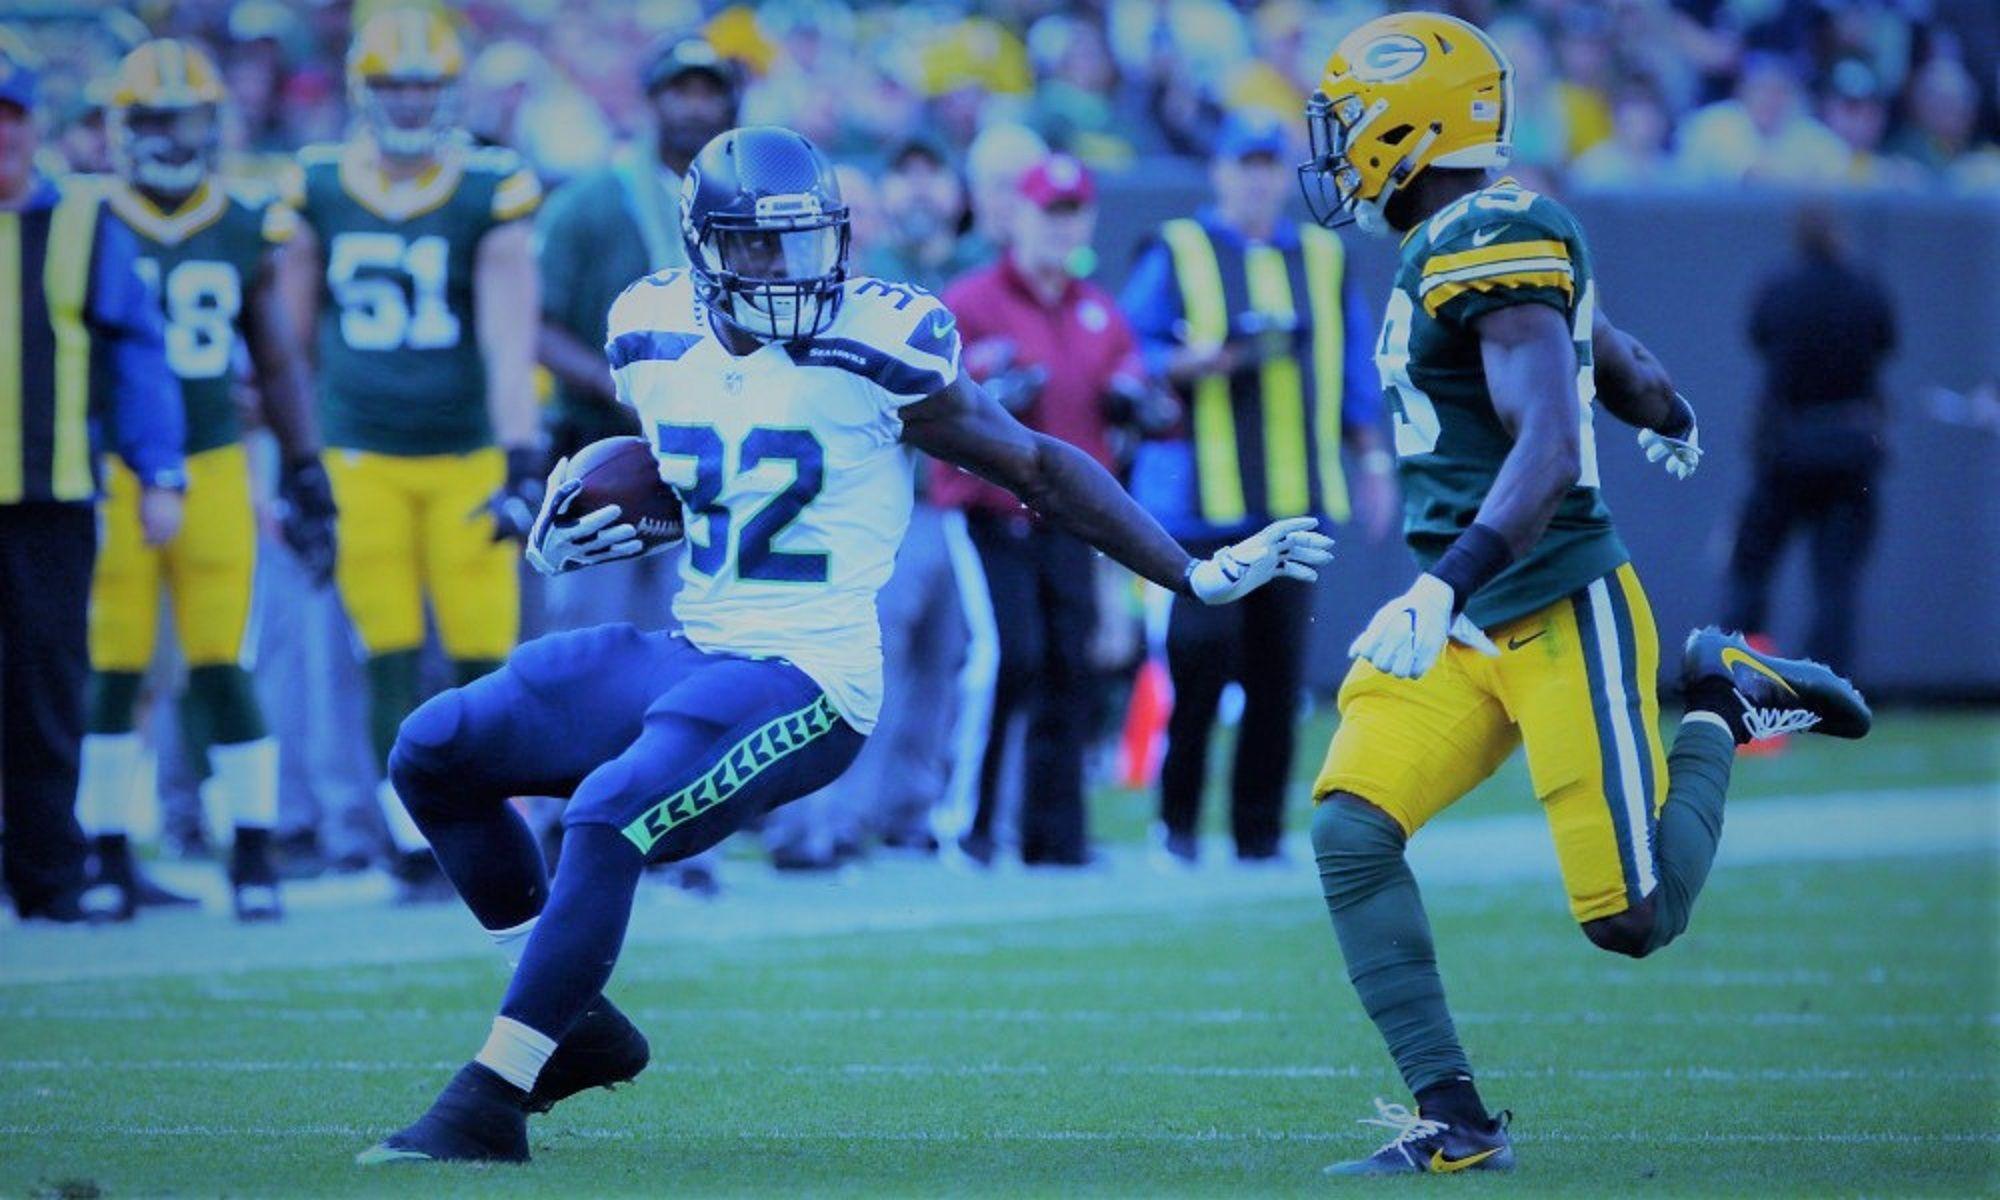 Green Bay Packers Vs Seattle Seahawks Live Stream Free Watch Nfl